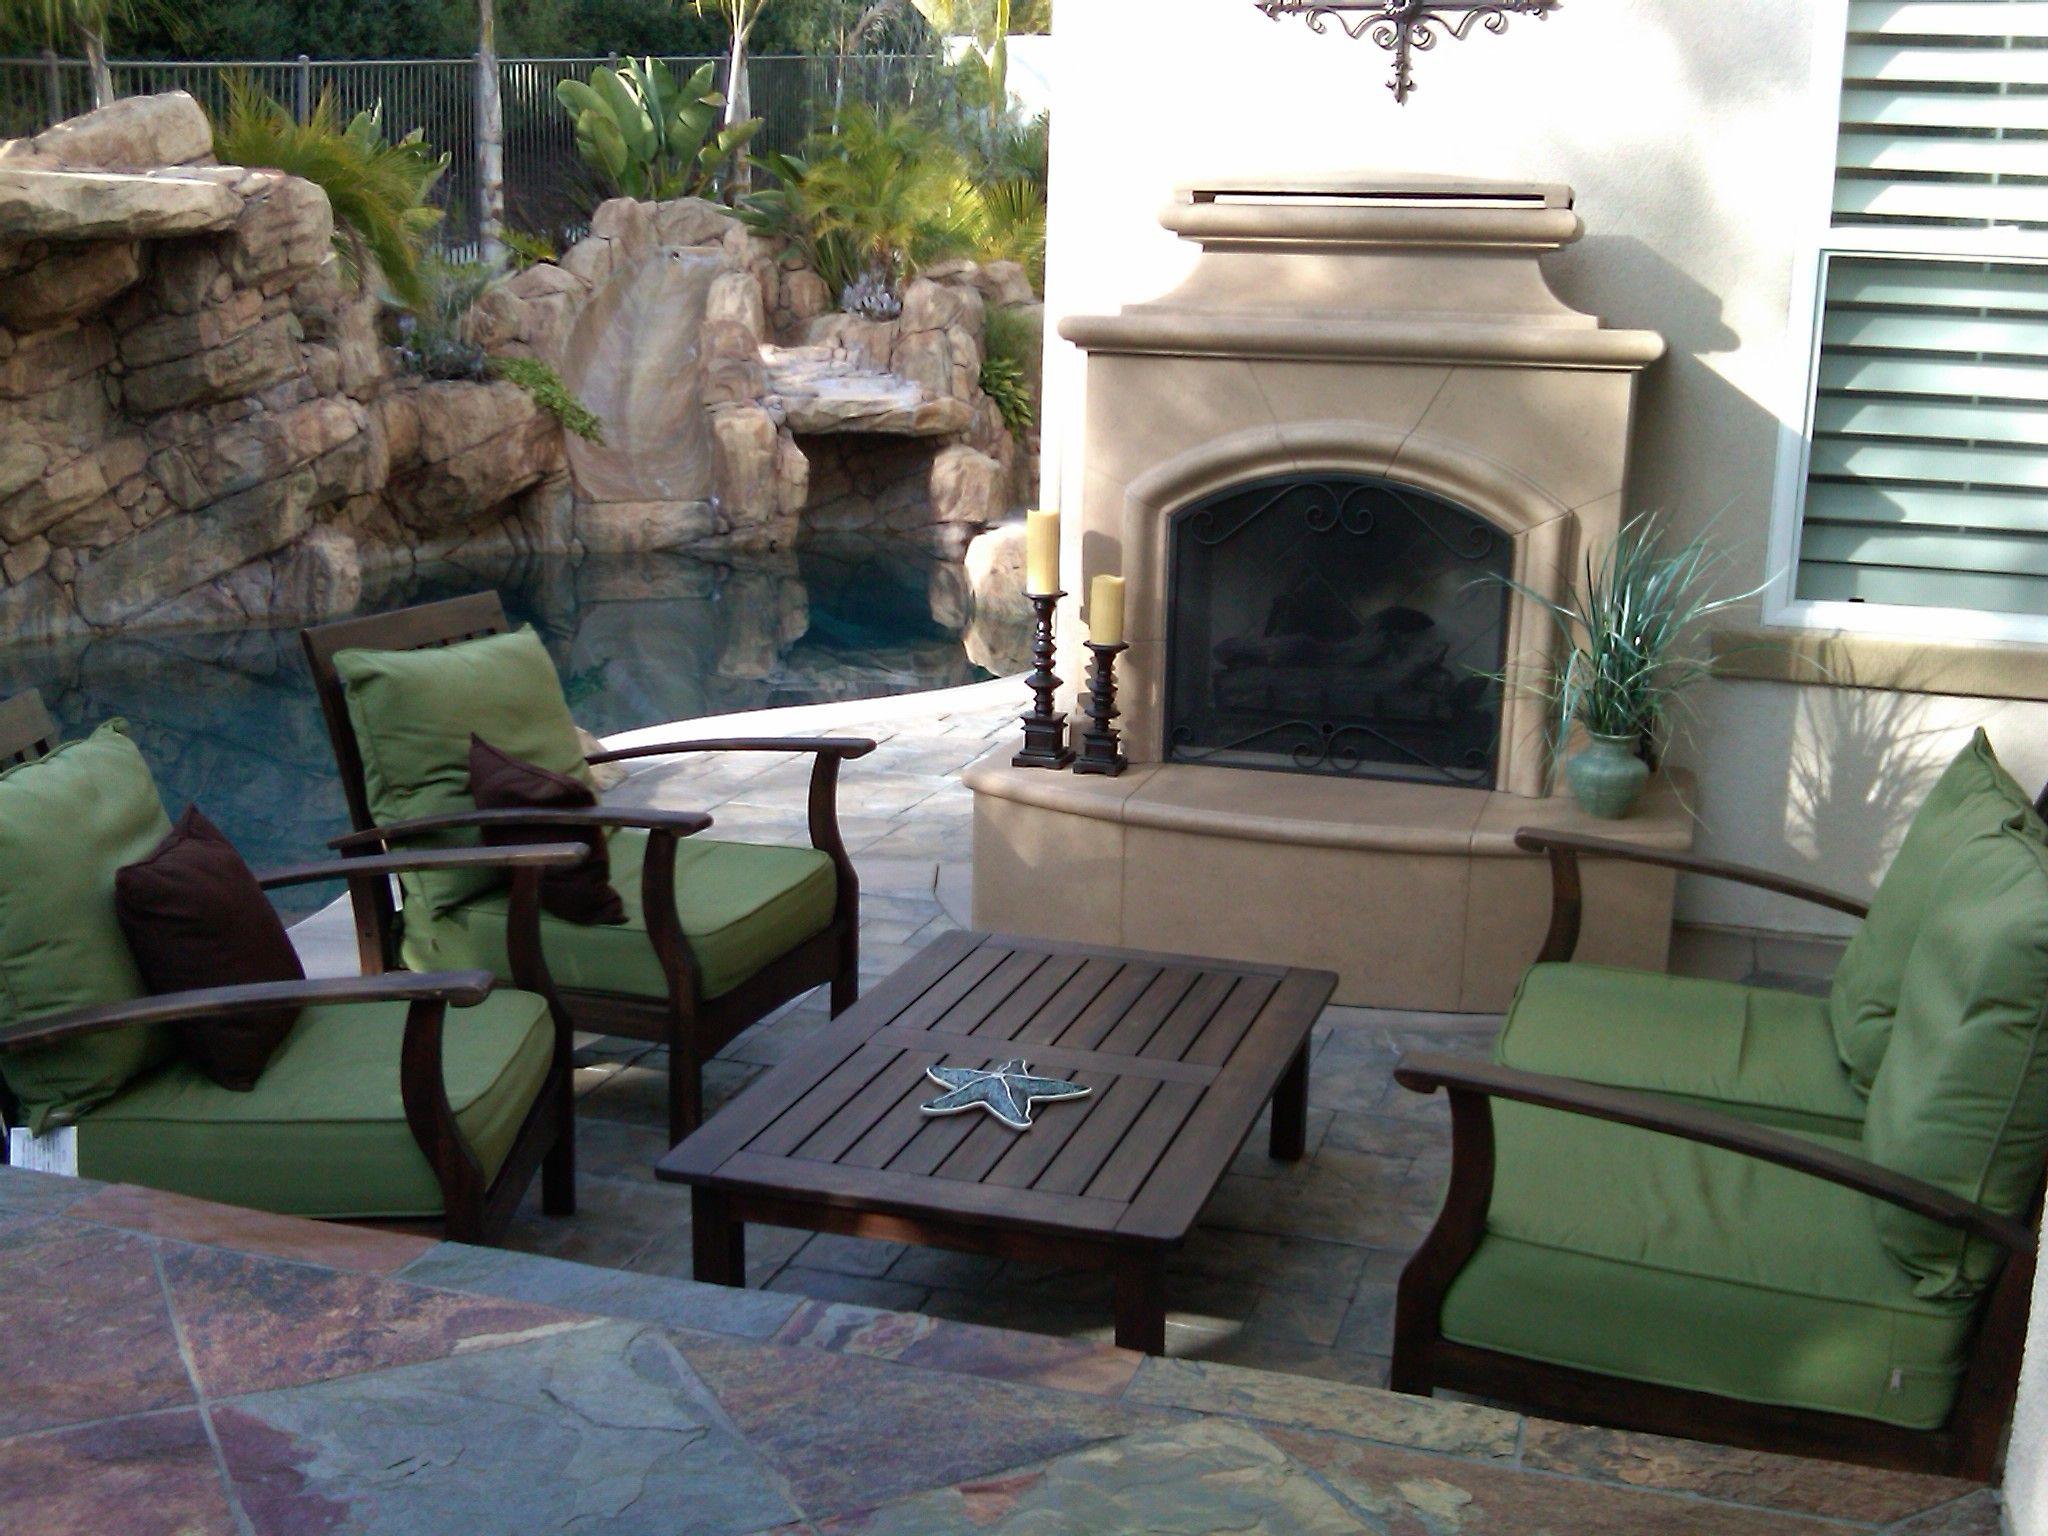 outdoor fireplaces las vegas | ... outdoor fireplace grand phoenix outdoor fireplace cordova outdoor